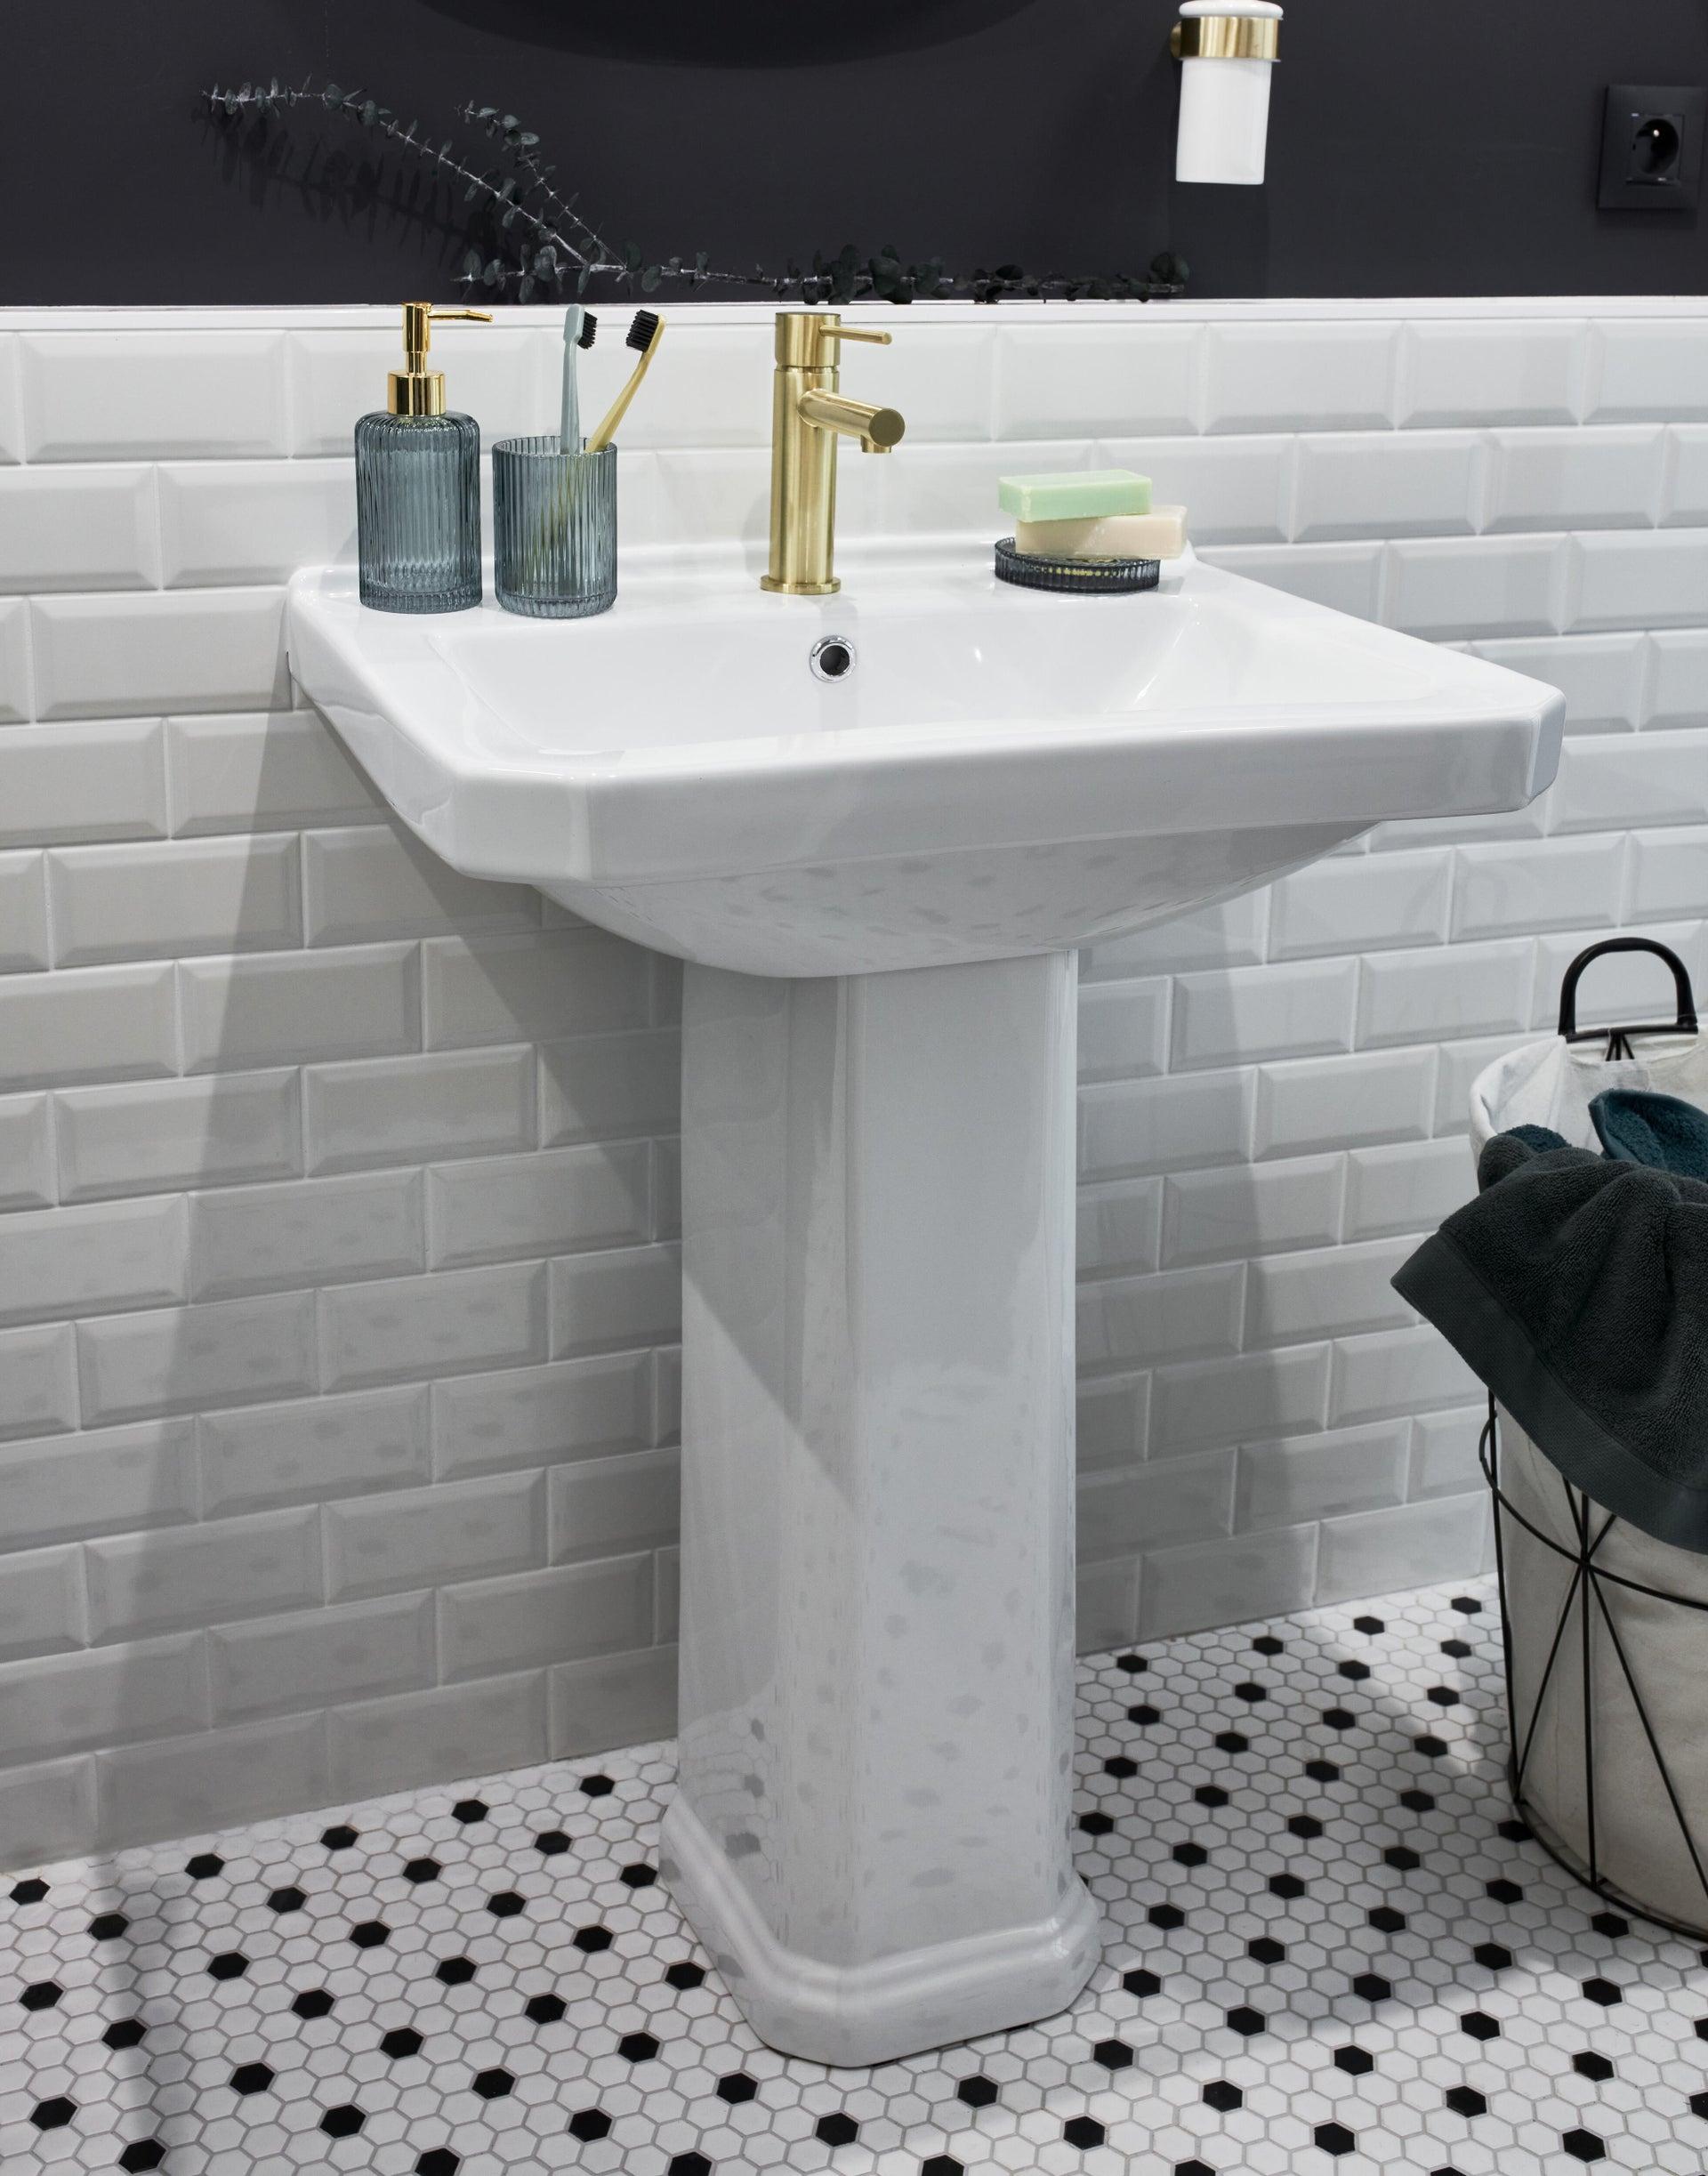 Lavabo quadrato L 43 x P 39.5 cm in ceramica bianco - 3